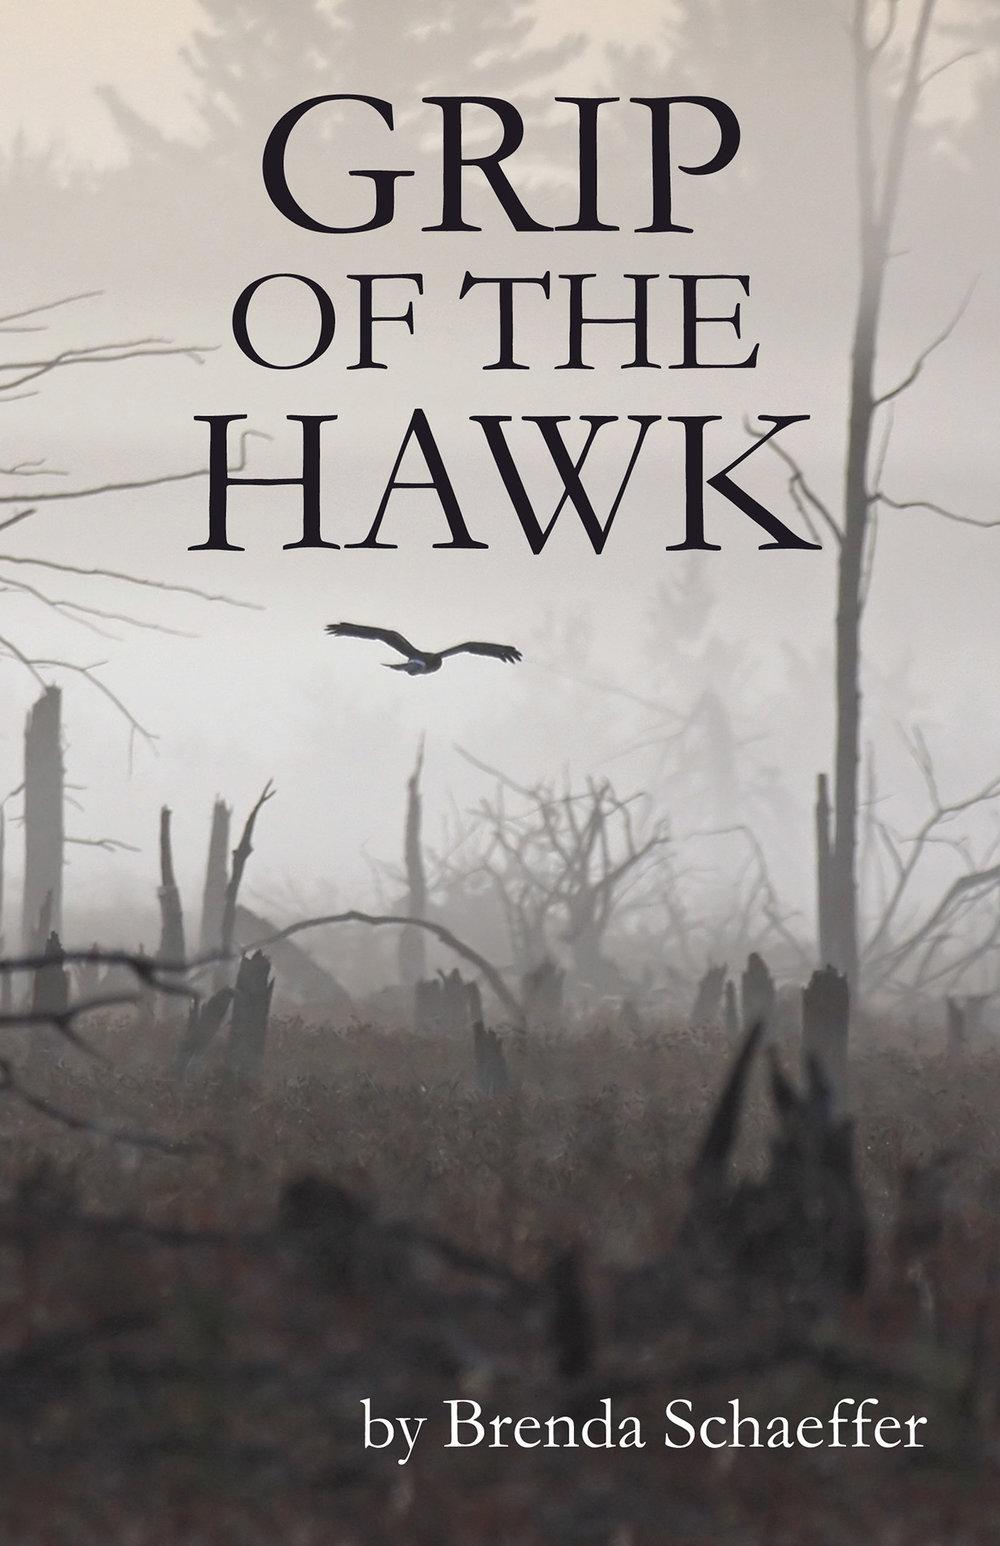 Gripof-the-Hawkcover.jpg